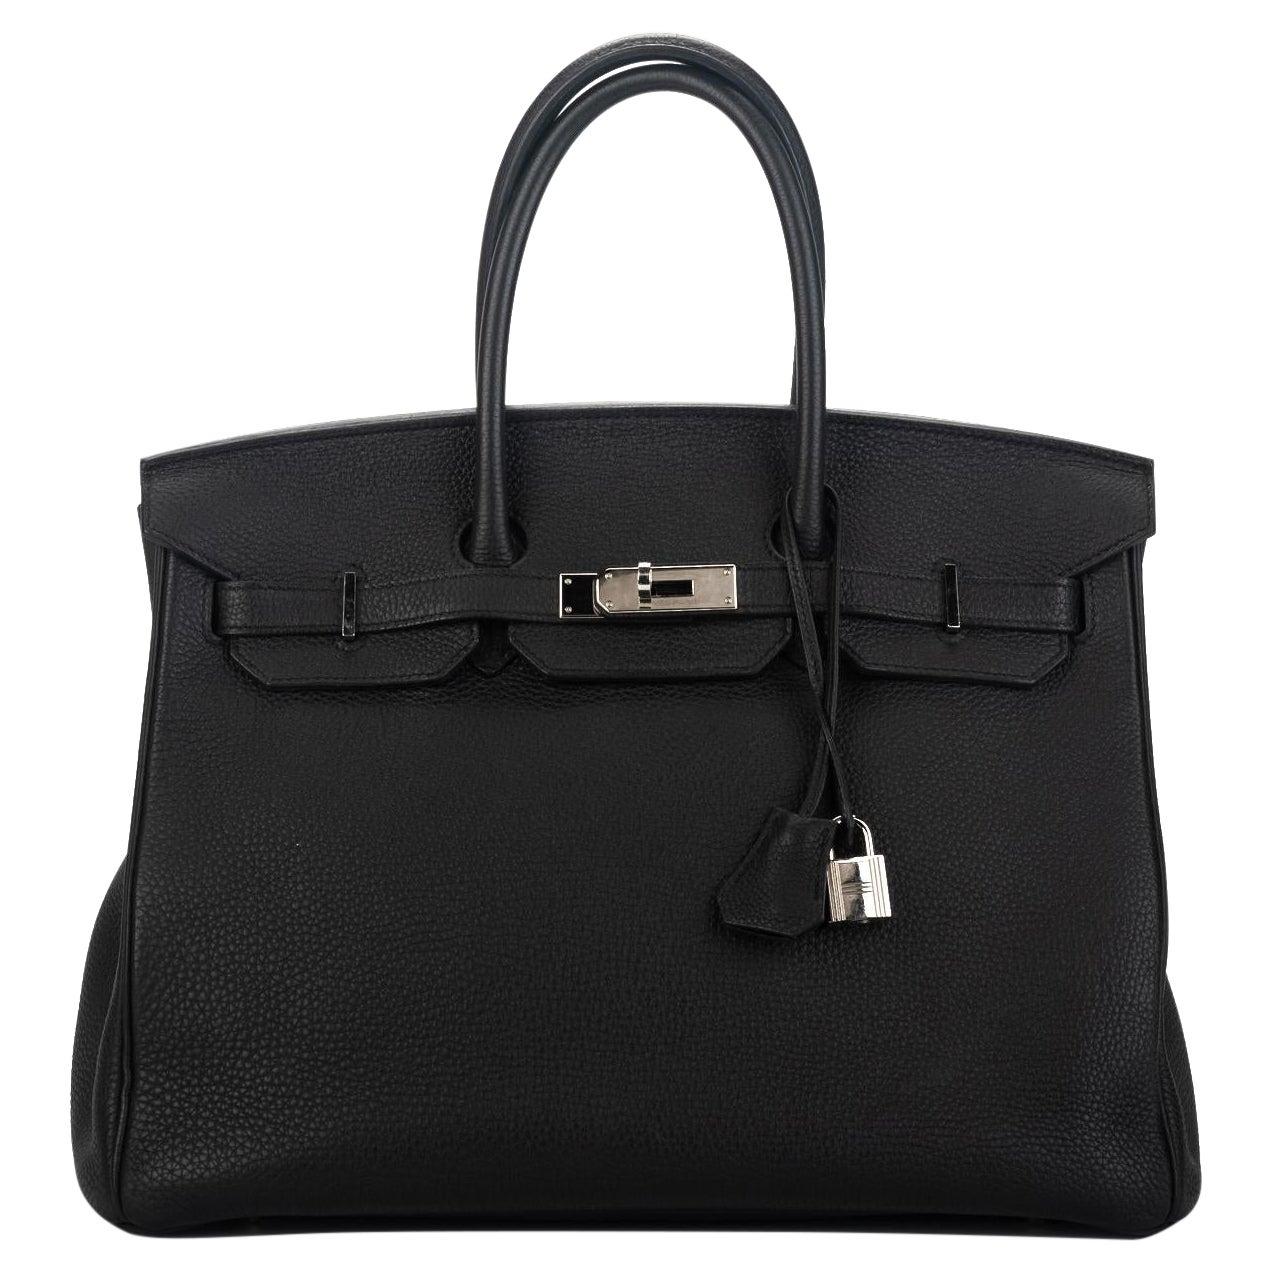 Hermes Birkin 35 Black Togo Palladium Bag